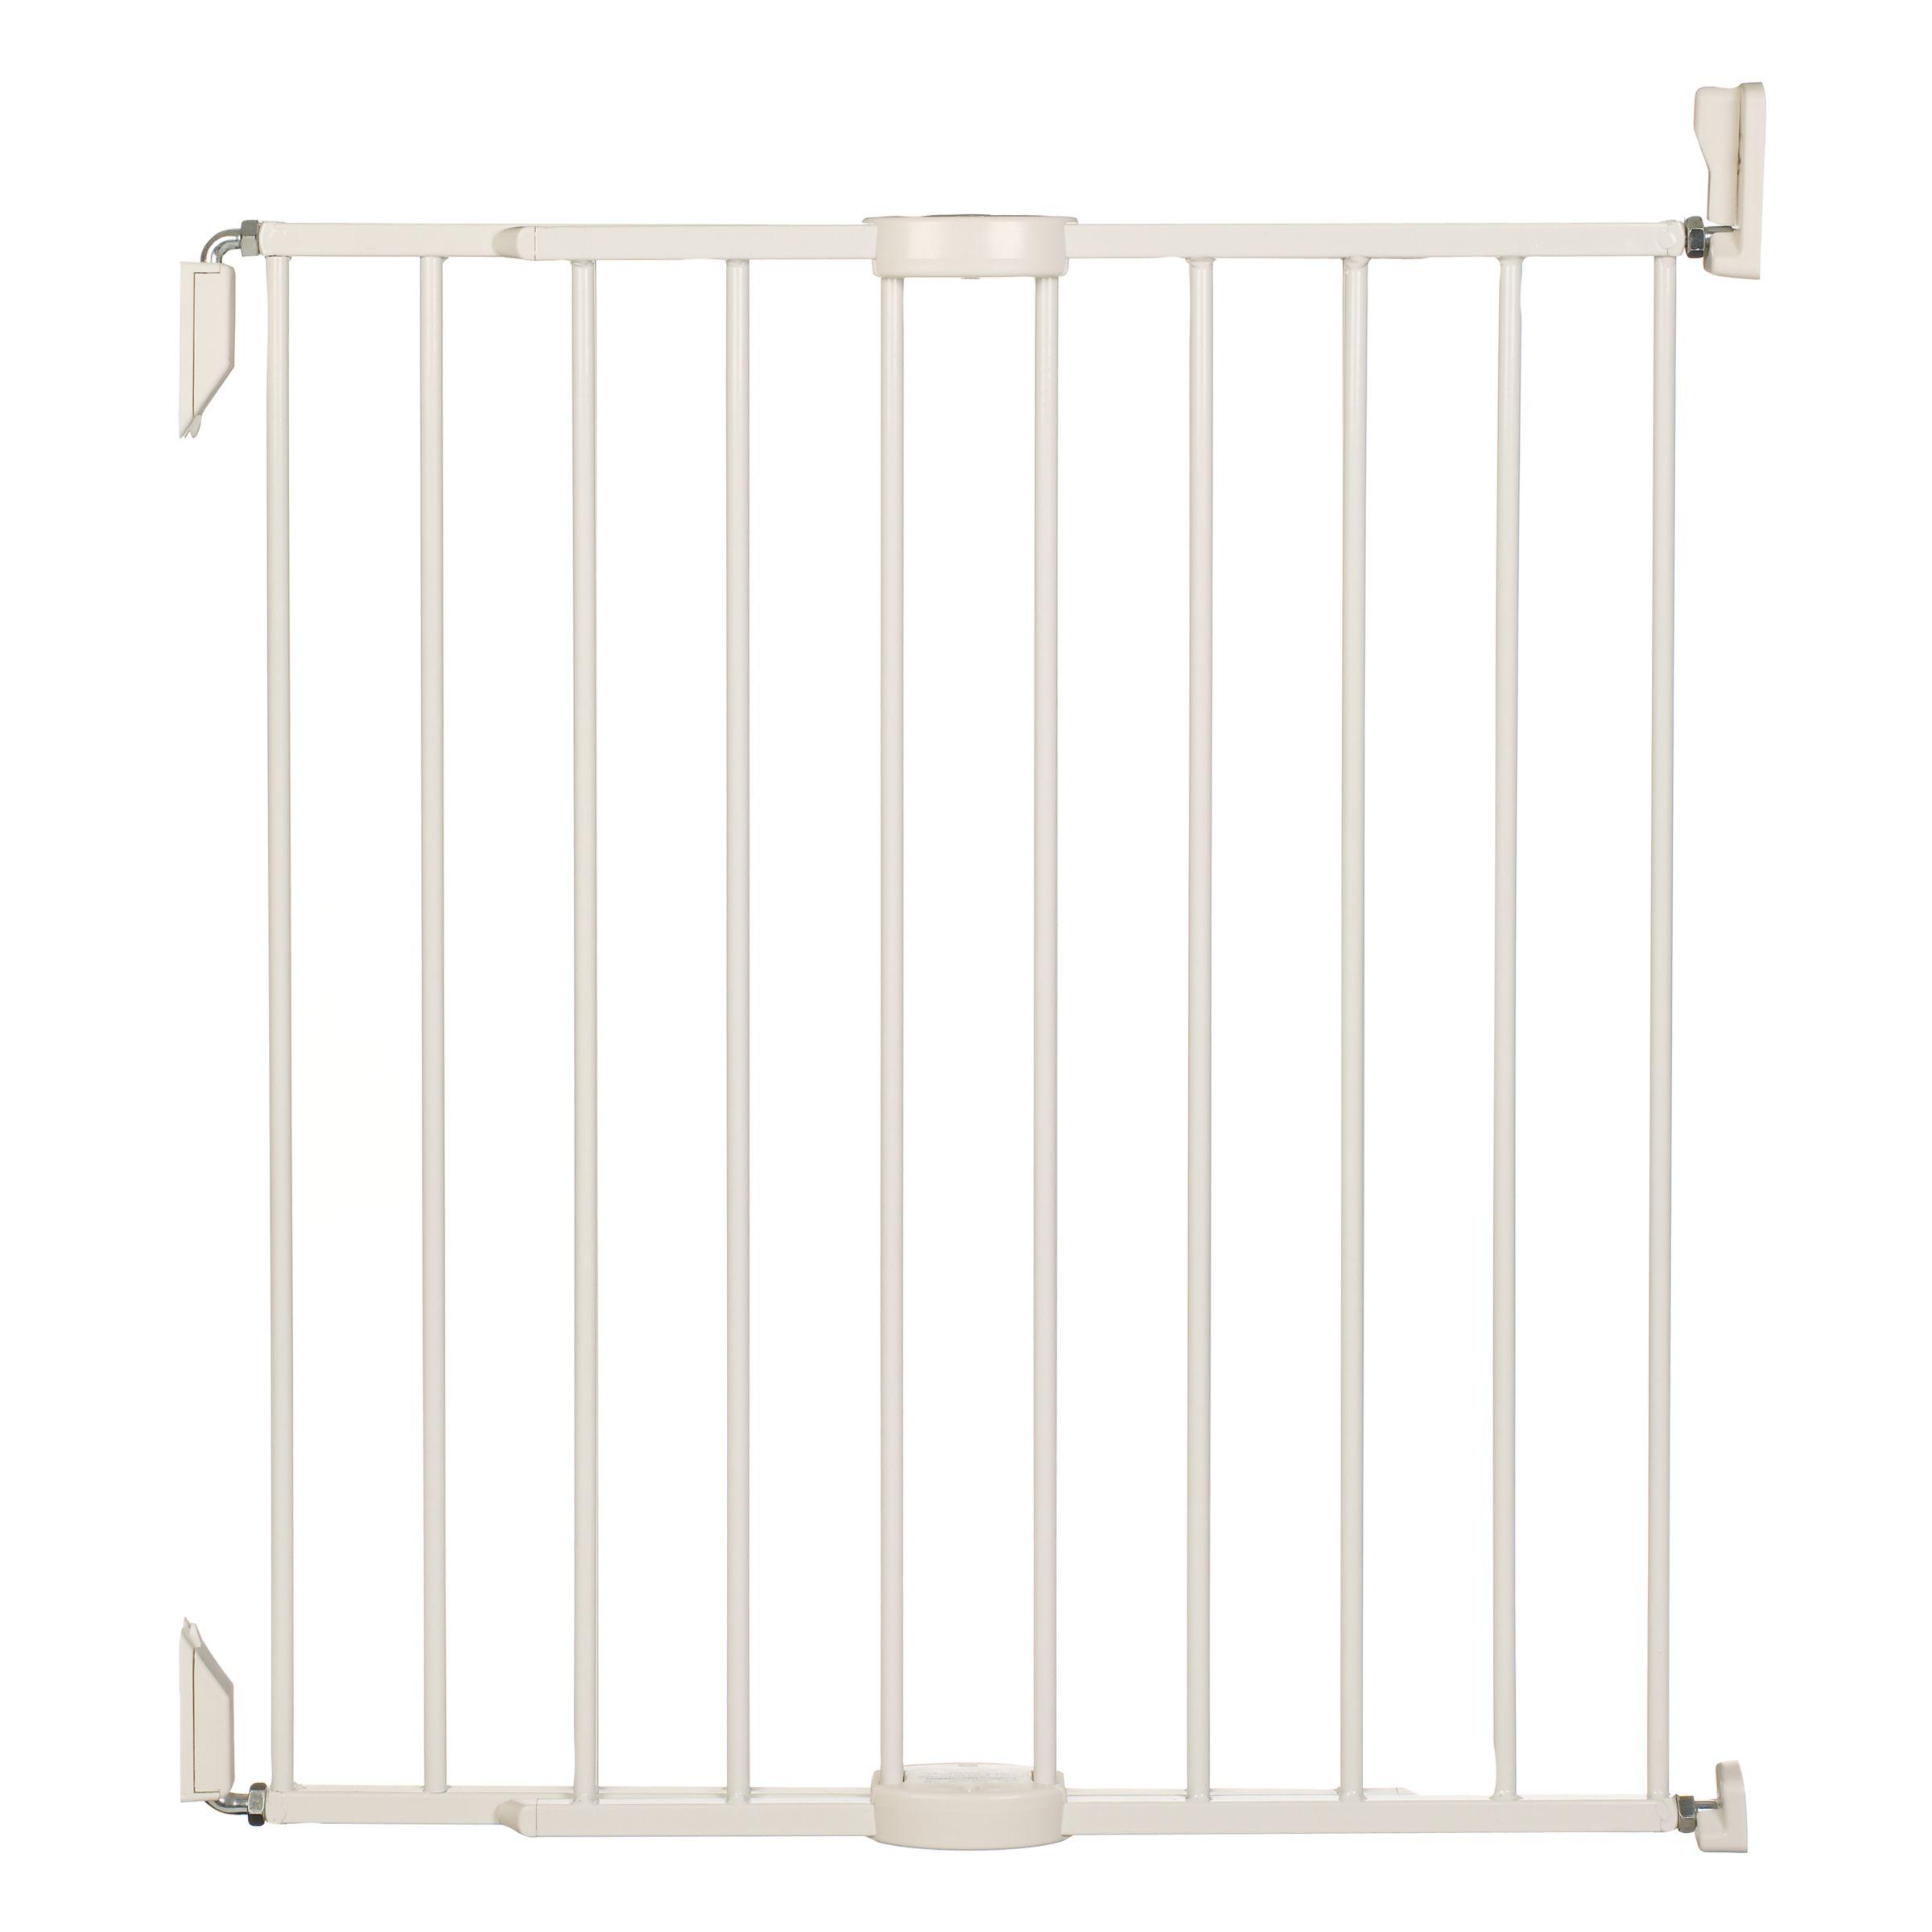 Extending Metal Stair Gate, White 230767371